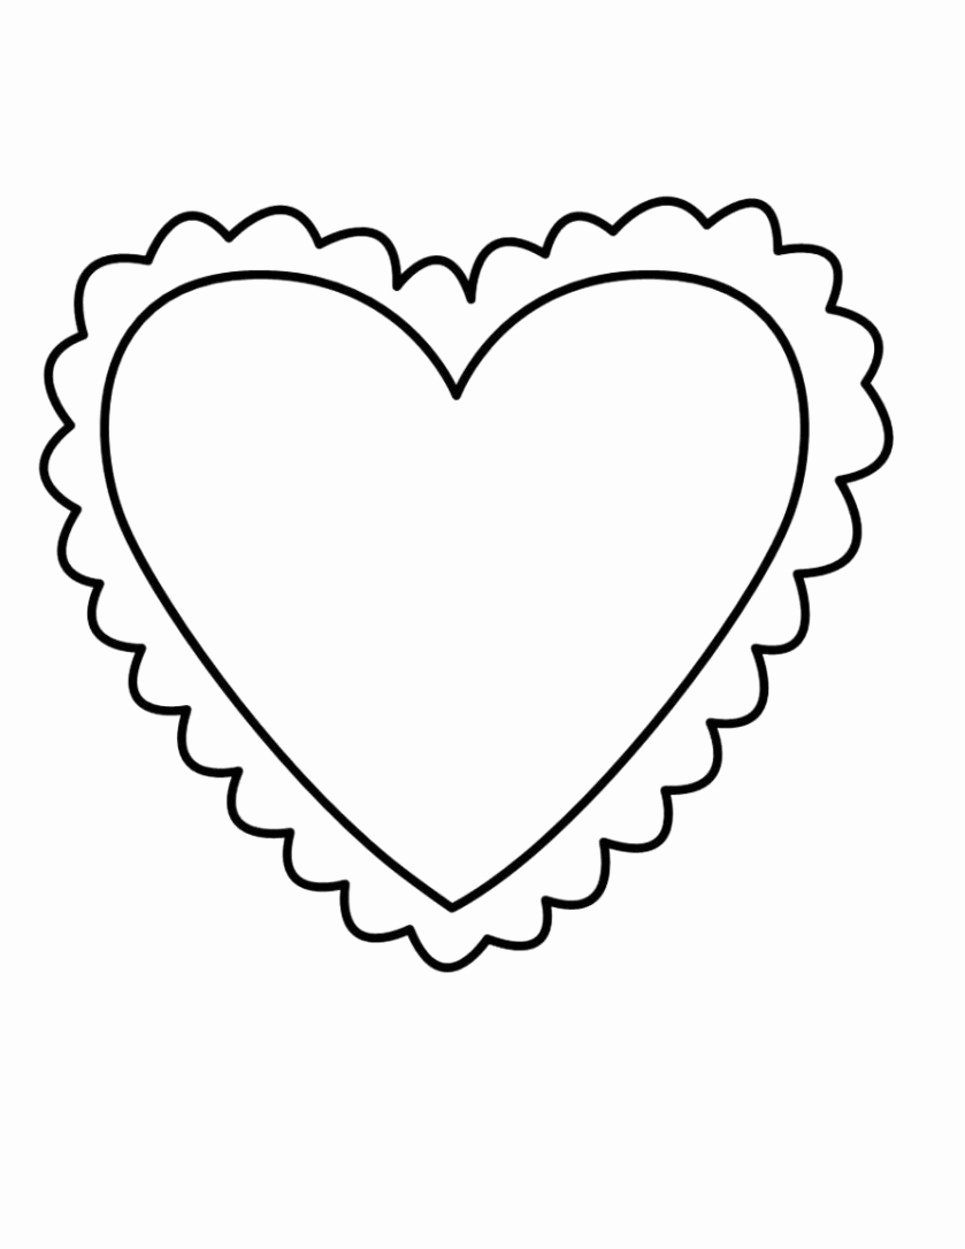 Valentine Hearts Coloring Pictures Unique Valentine Heart Coloring Pages Best Coloring Pages For In 2020 Heart Coloring Pages Shape Coloring Pages Love Coloring Pages